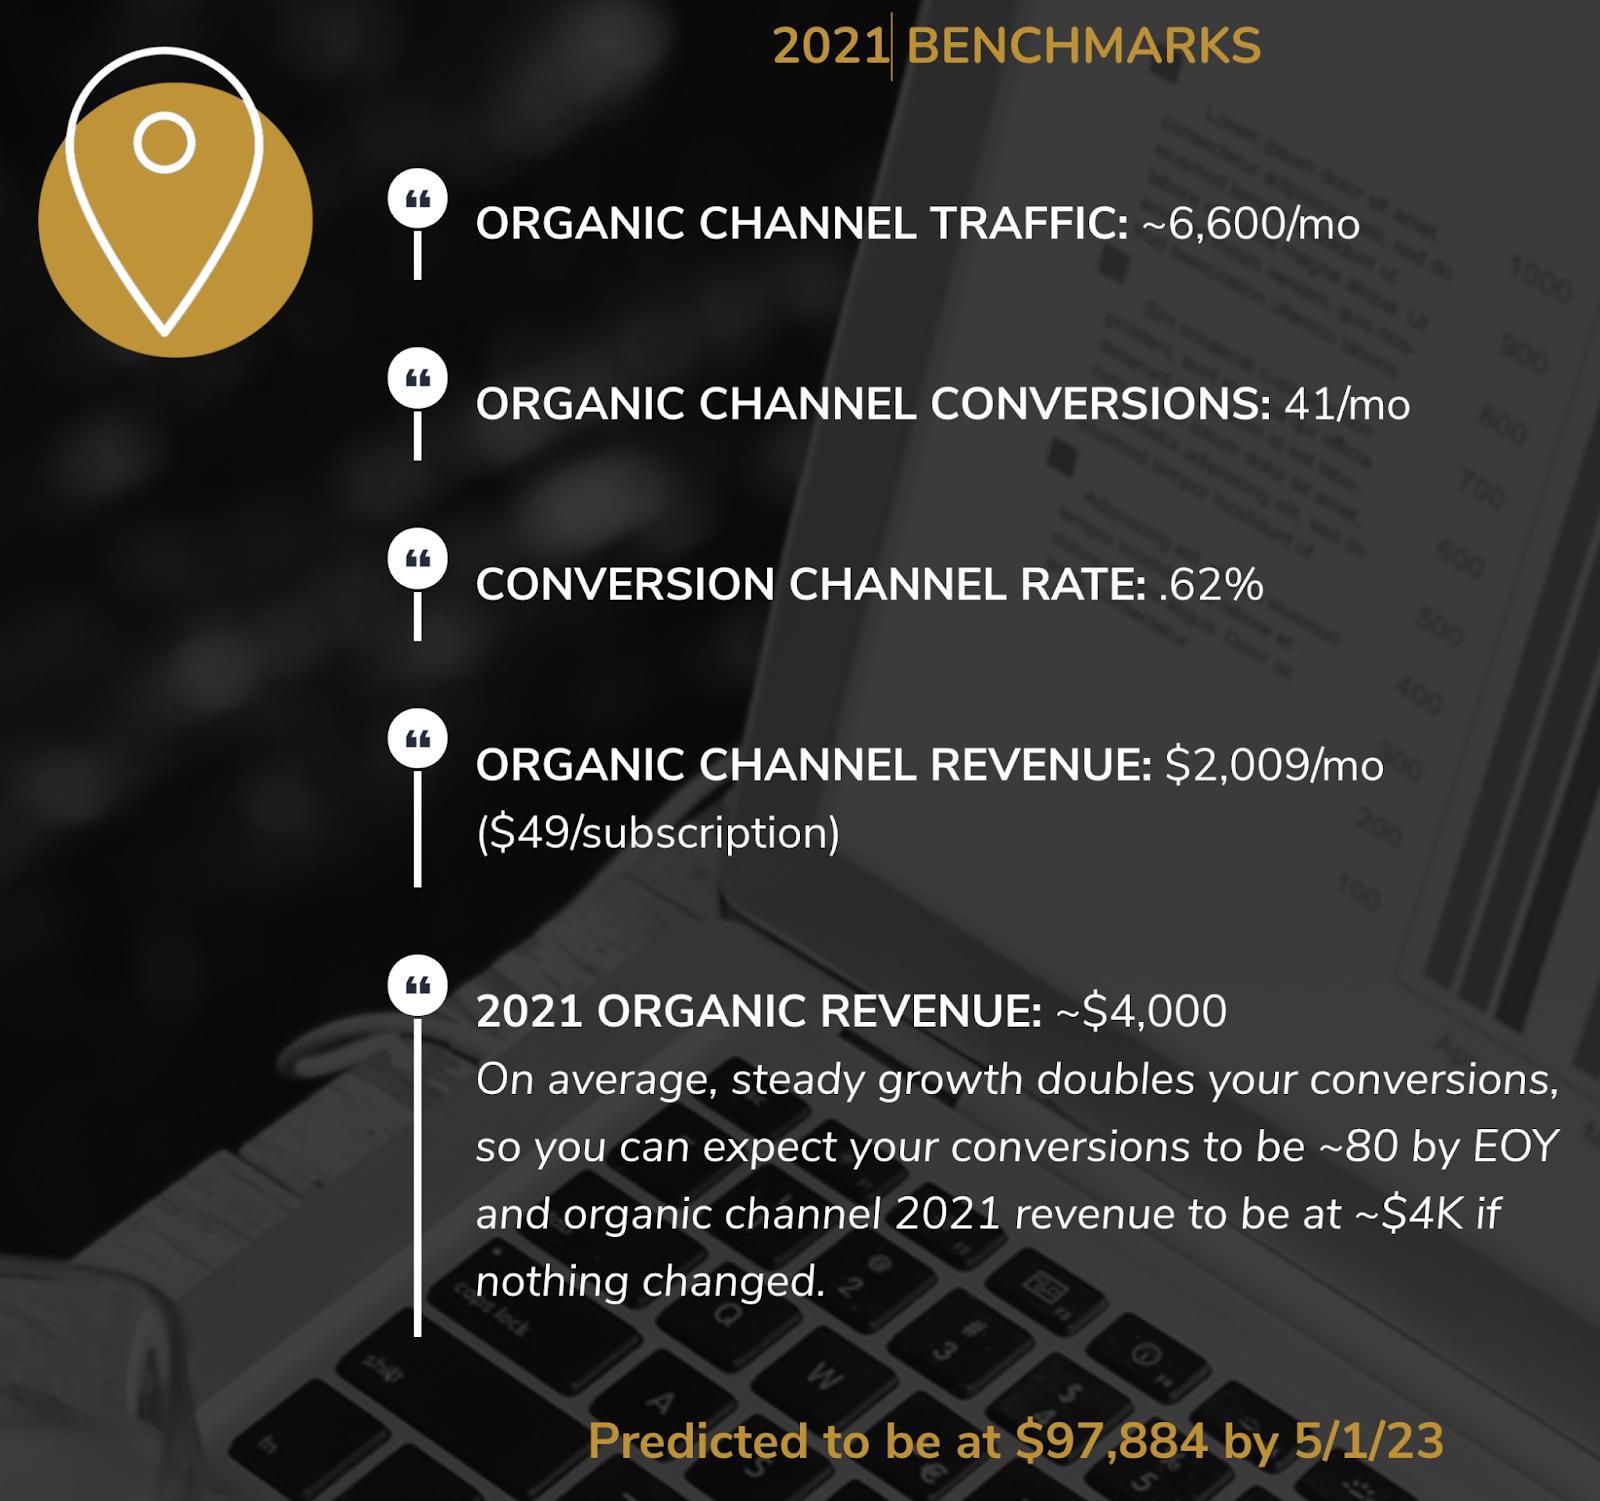 2021 breakdown of organic traffic, revenue, and conversions